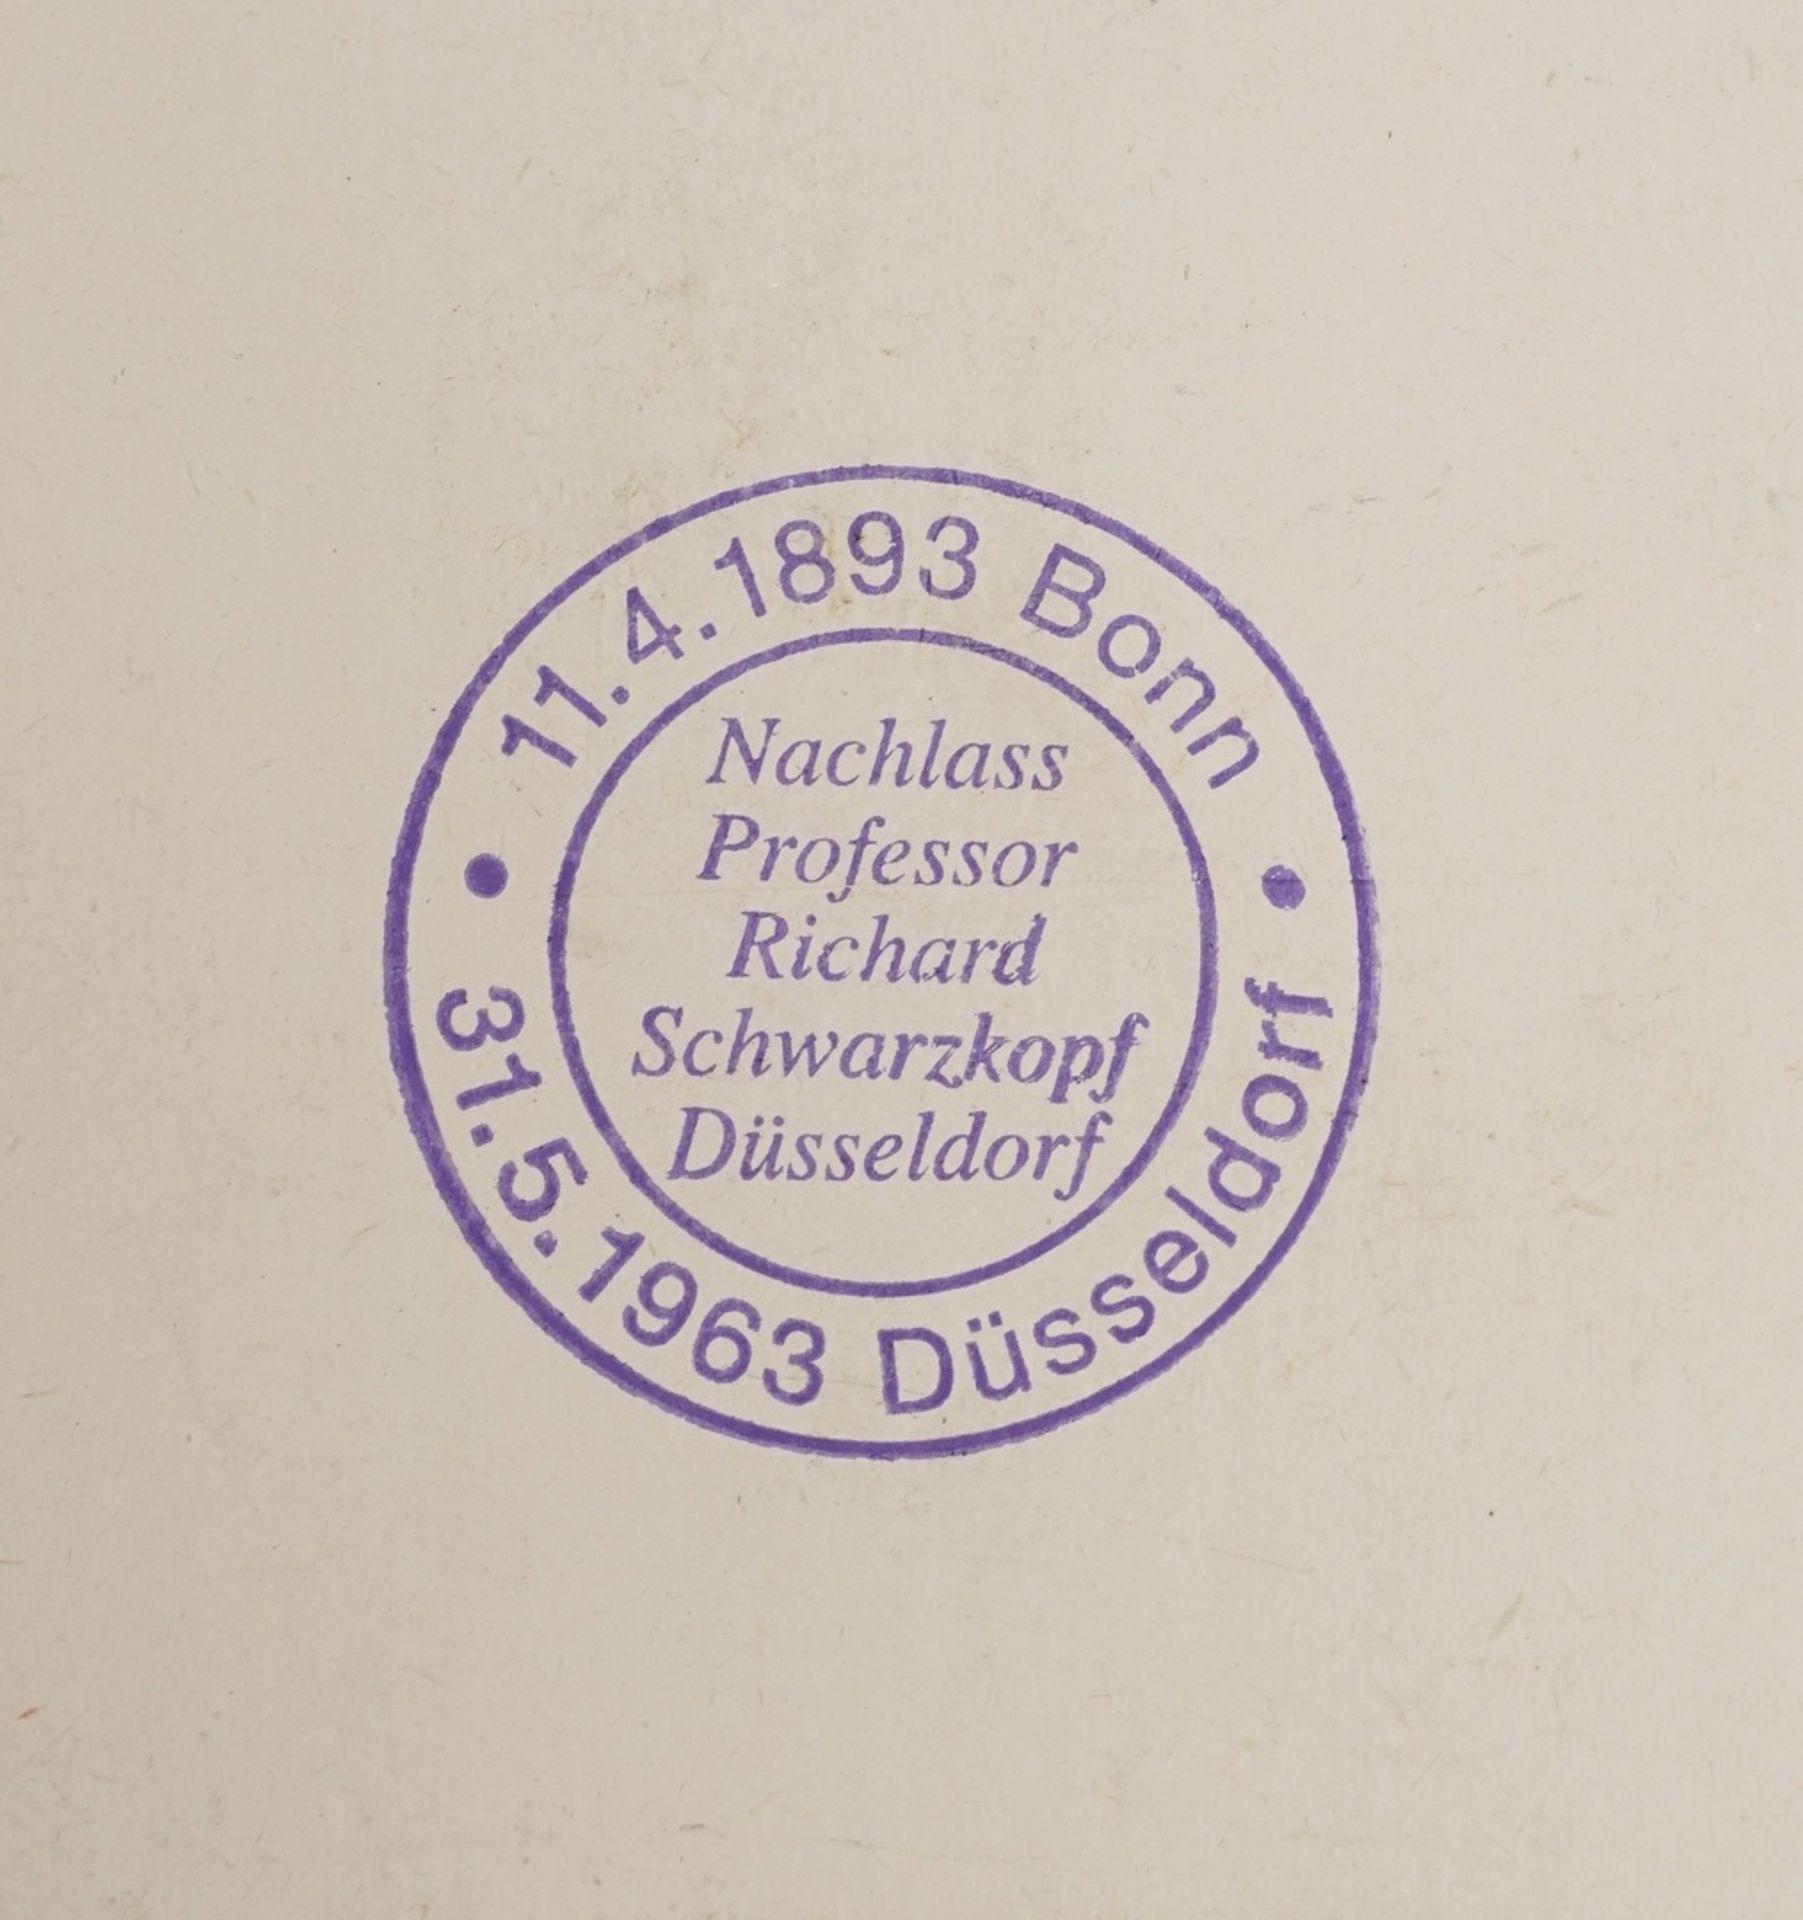 Richard Schwarzkopf, Figurengruppe - Bild 4 aus 4